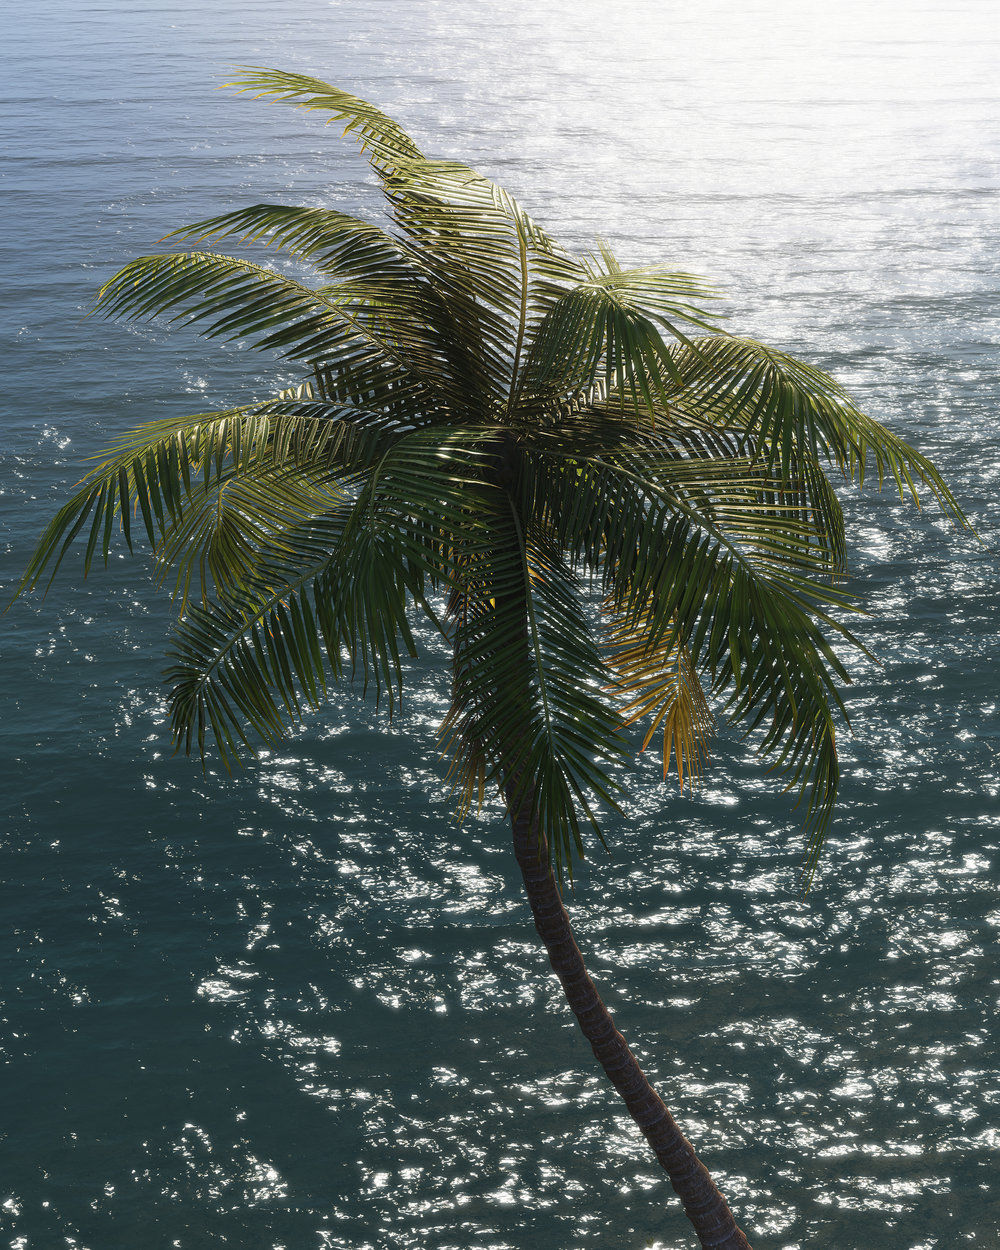 Palm 2017.03.20 - 10.14.17.79_web.jpg